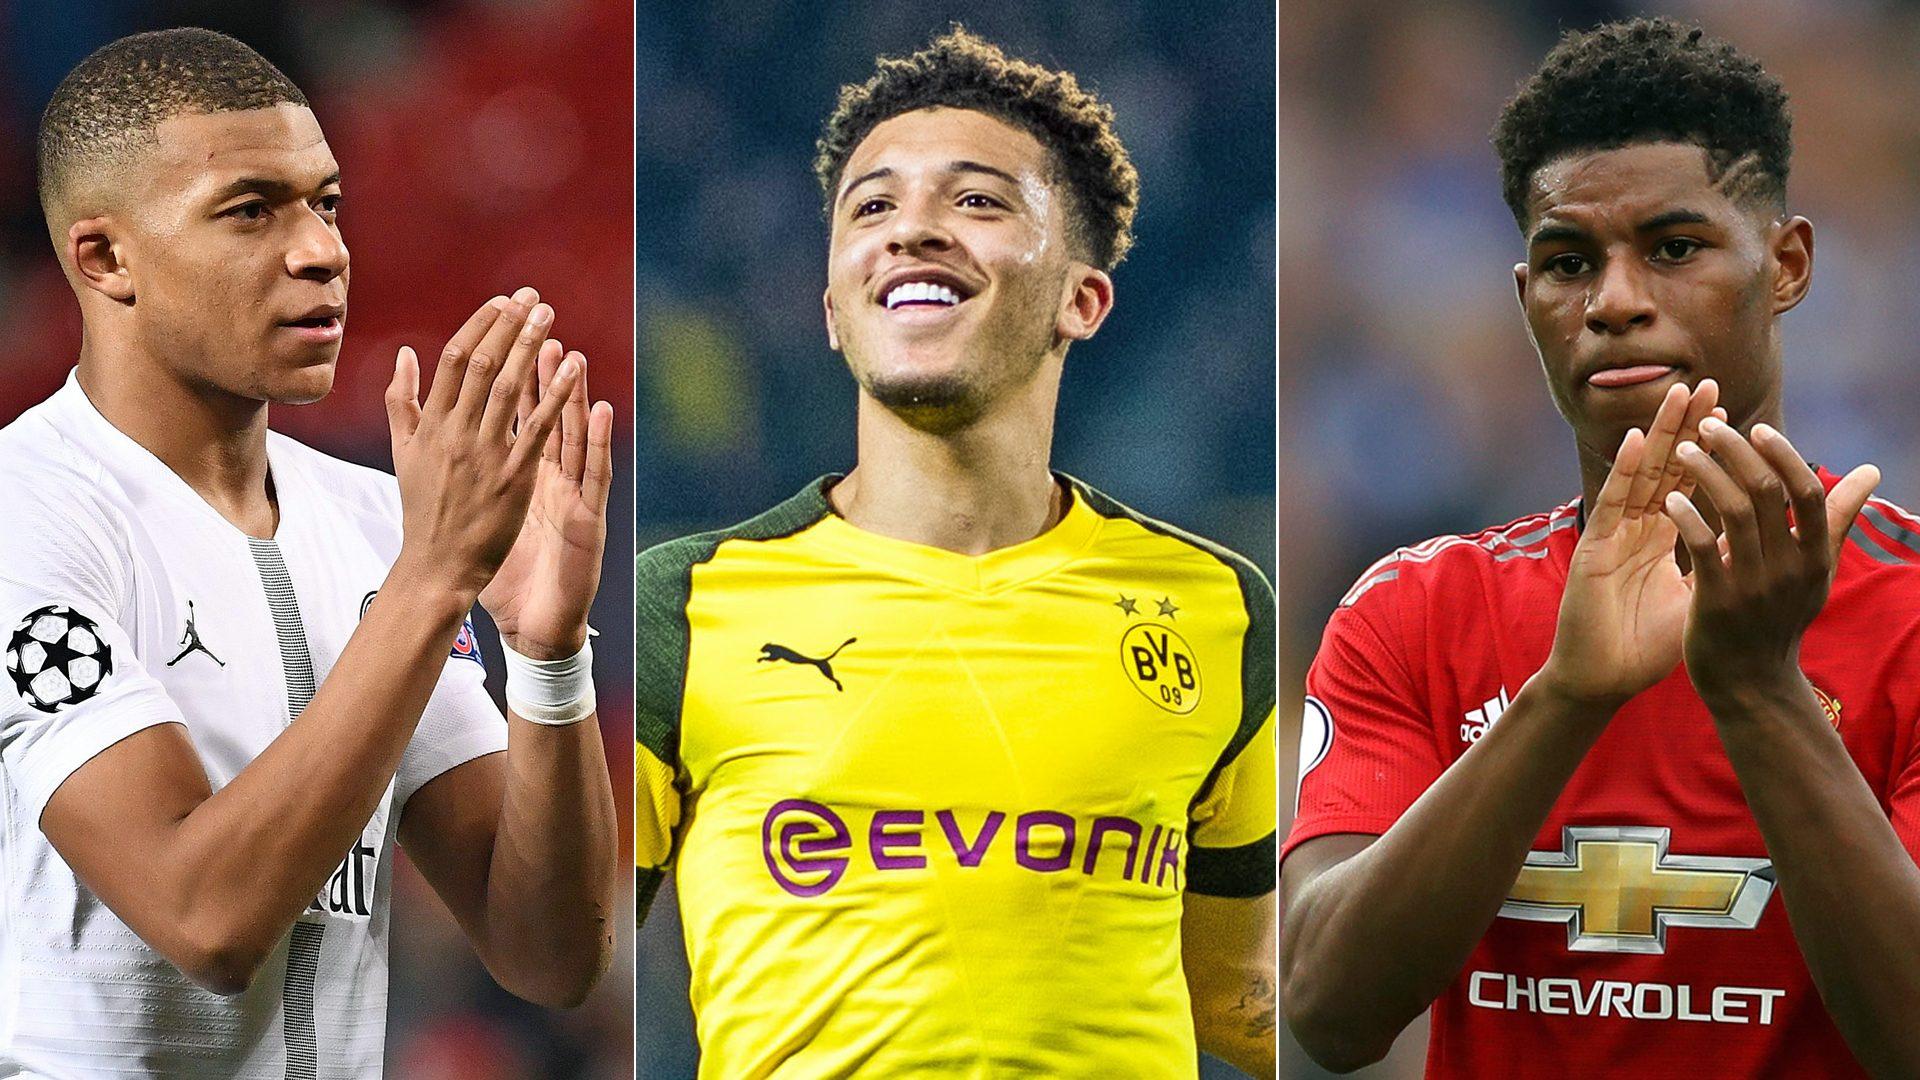 Bundesliga Borussia Dortmund S Jadon Sancho I Watch Mbappe And Rashford I M Sure They Watch Me Too